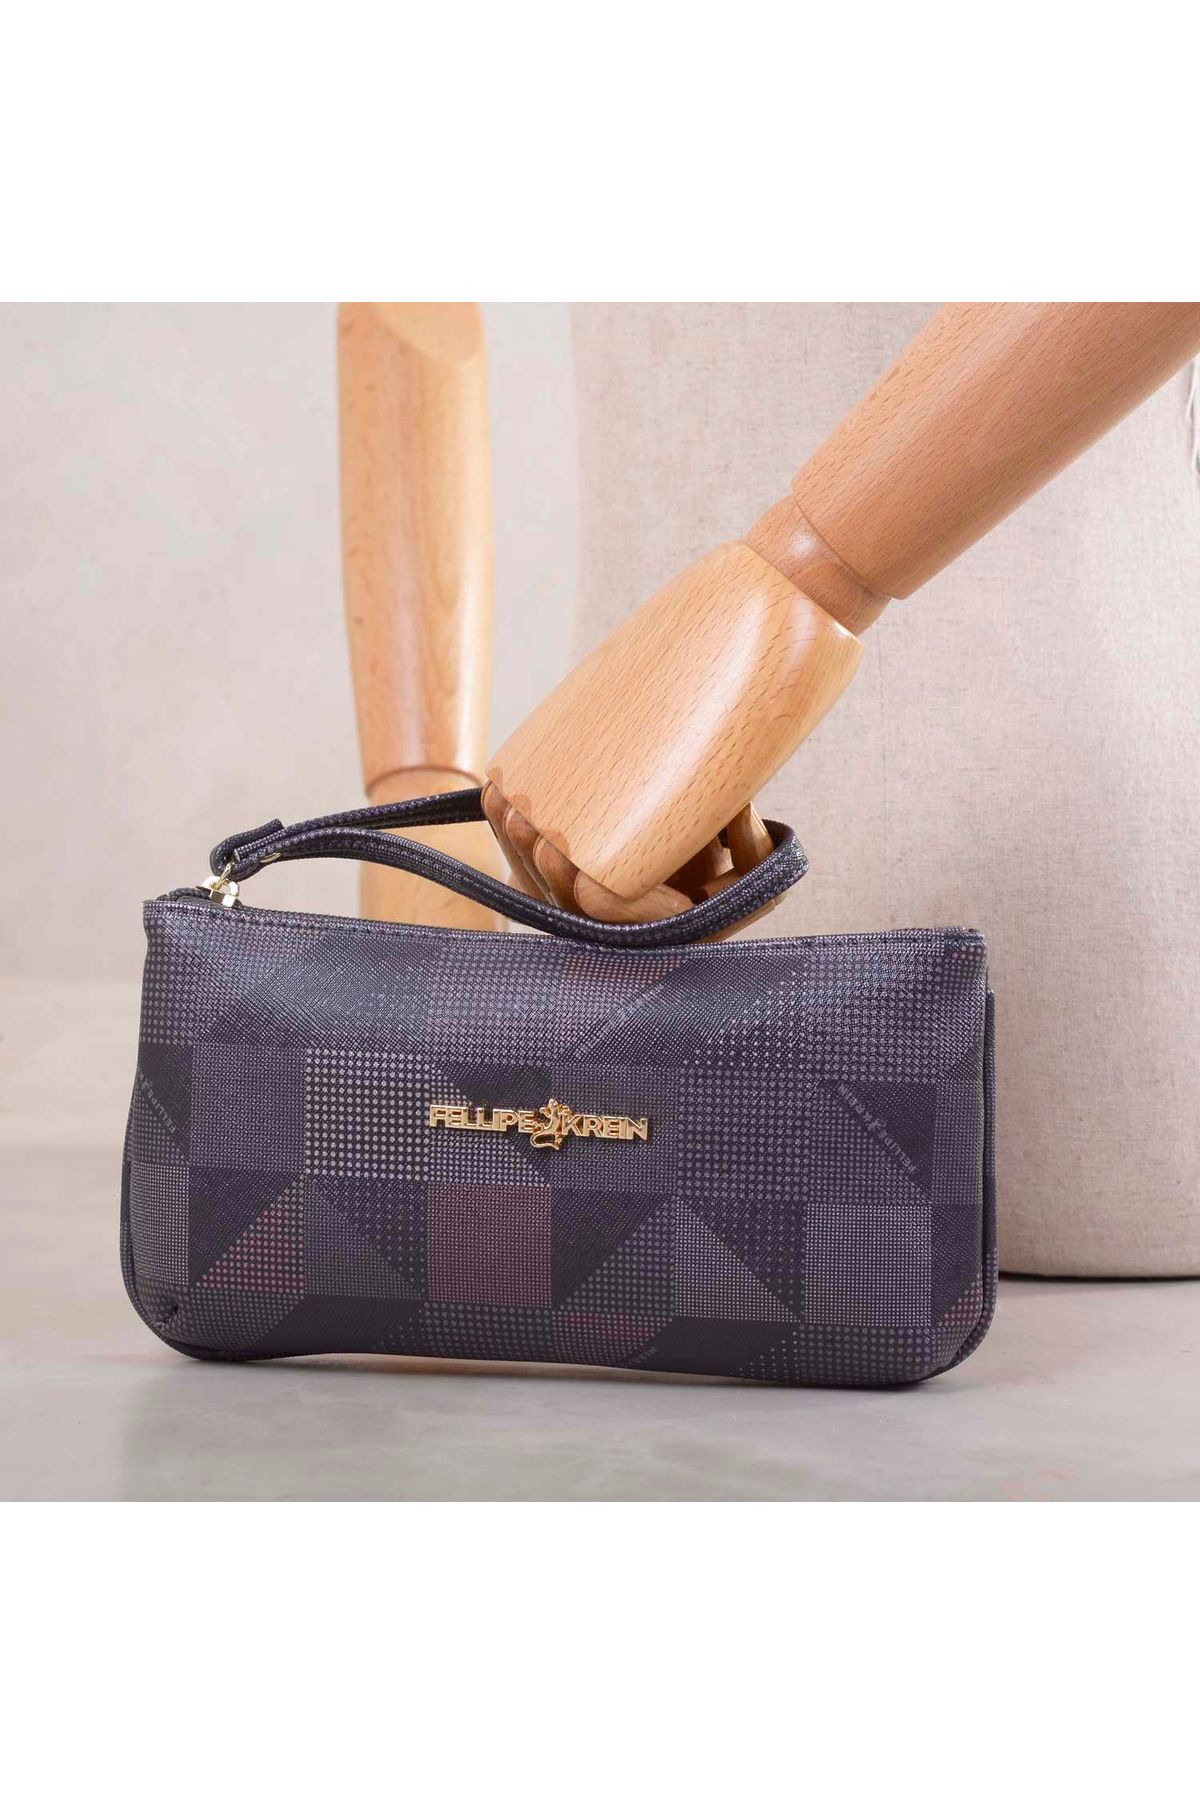 b01b09f26 Carteira Feminina Fellipe Krein Sepy | Mundial Calçados - Mundial ...